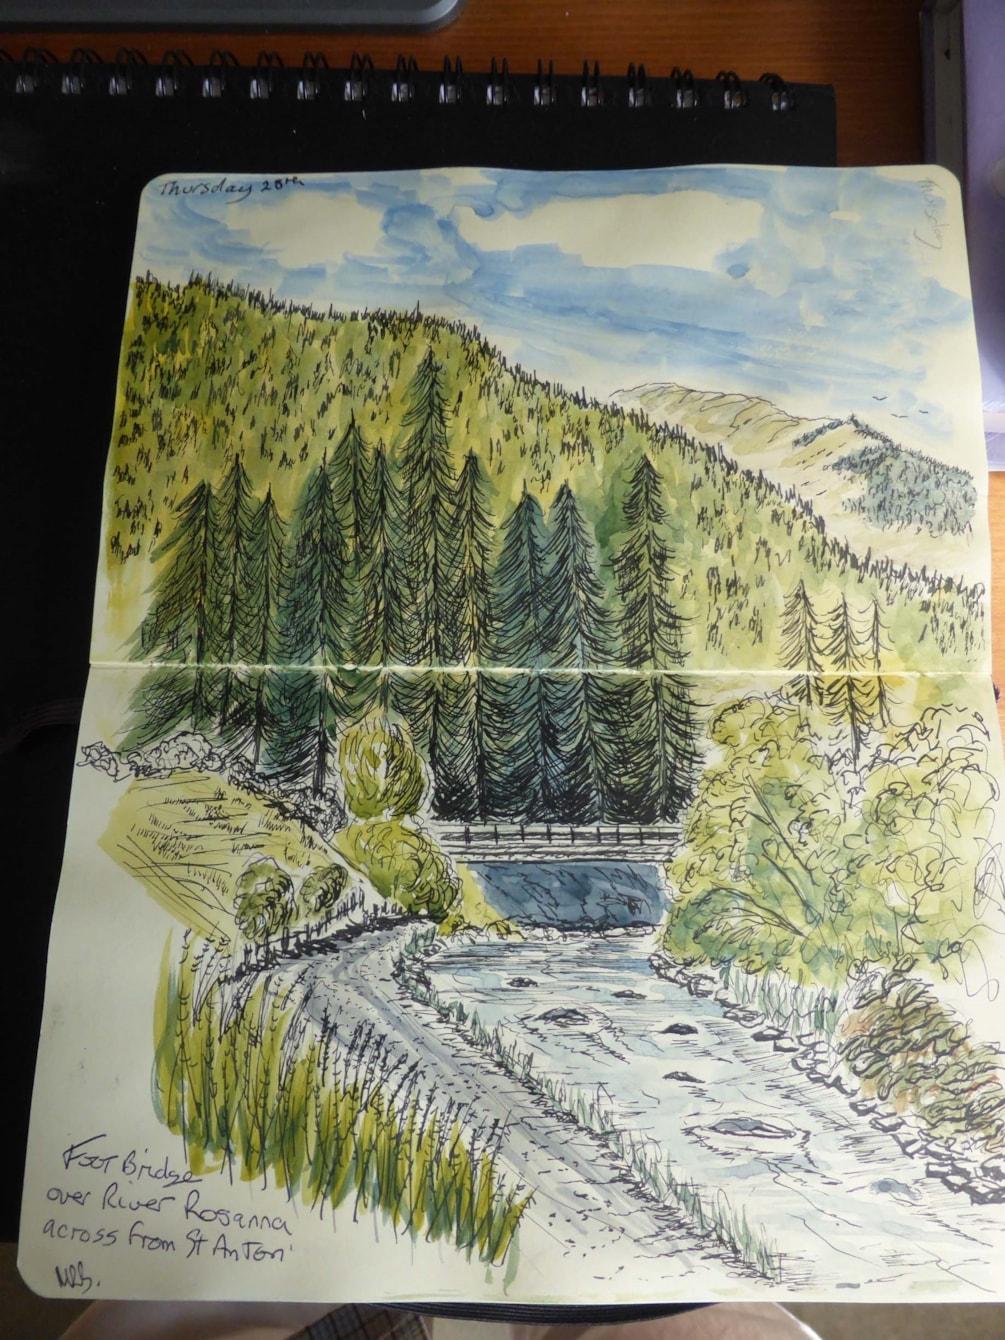 Sketch Footbridge on Rosanna River St Anton Austria